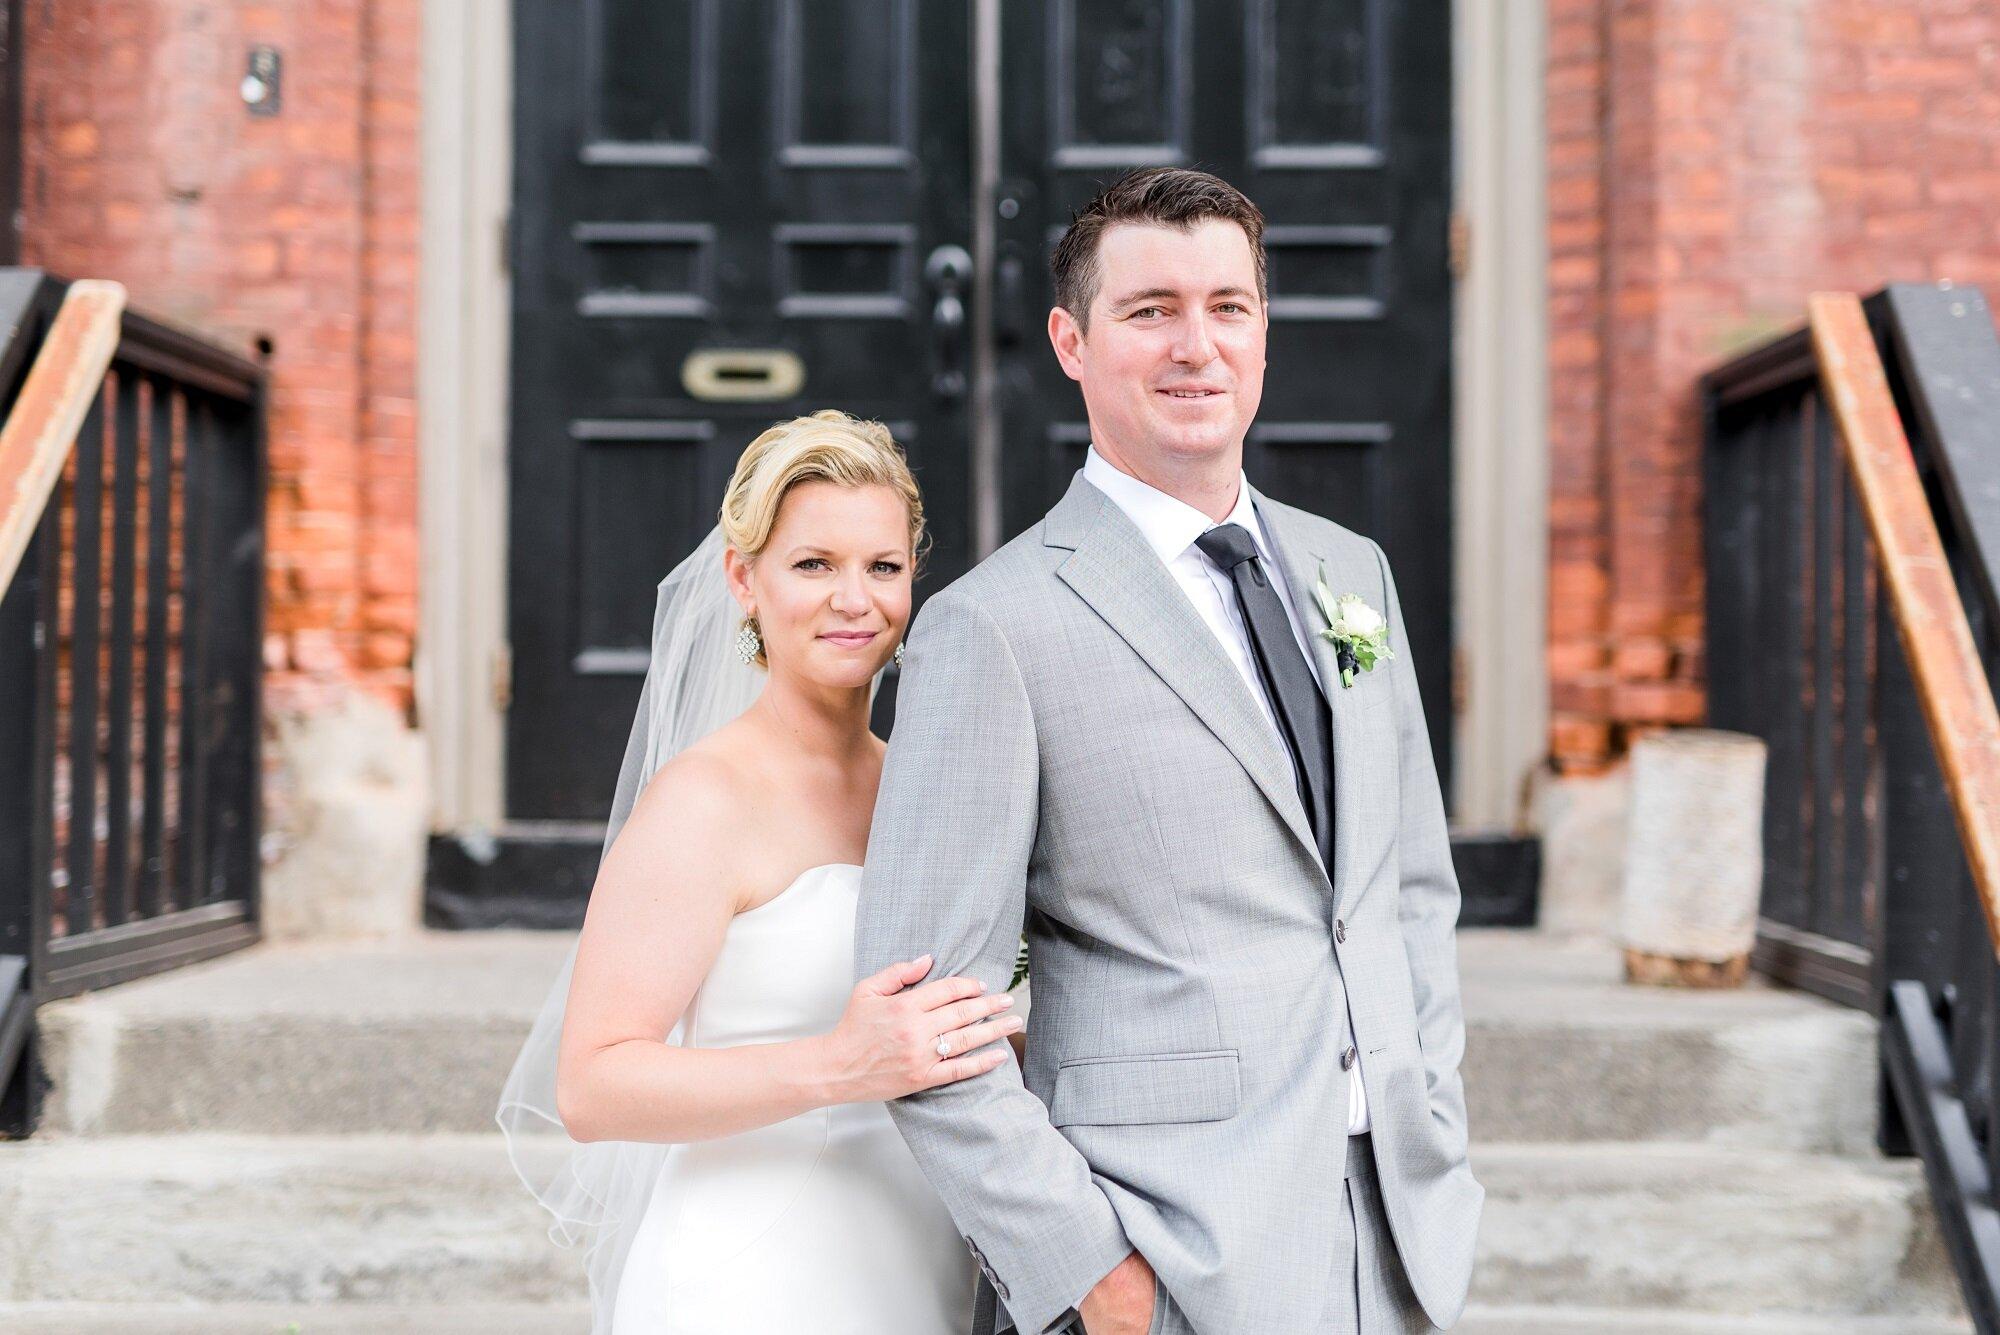 berkeley-field-house-wedding-kj-and-co-10.jpg